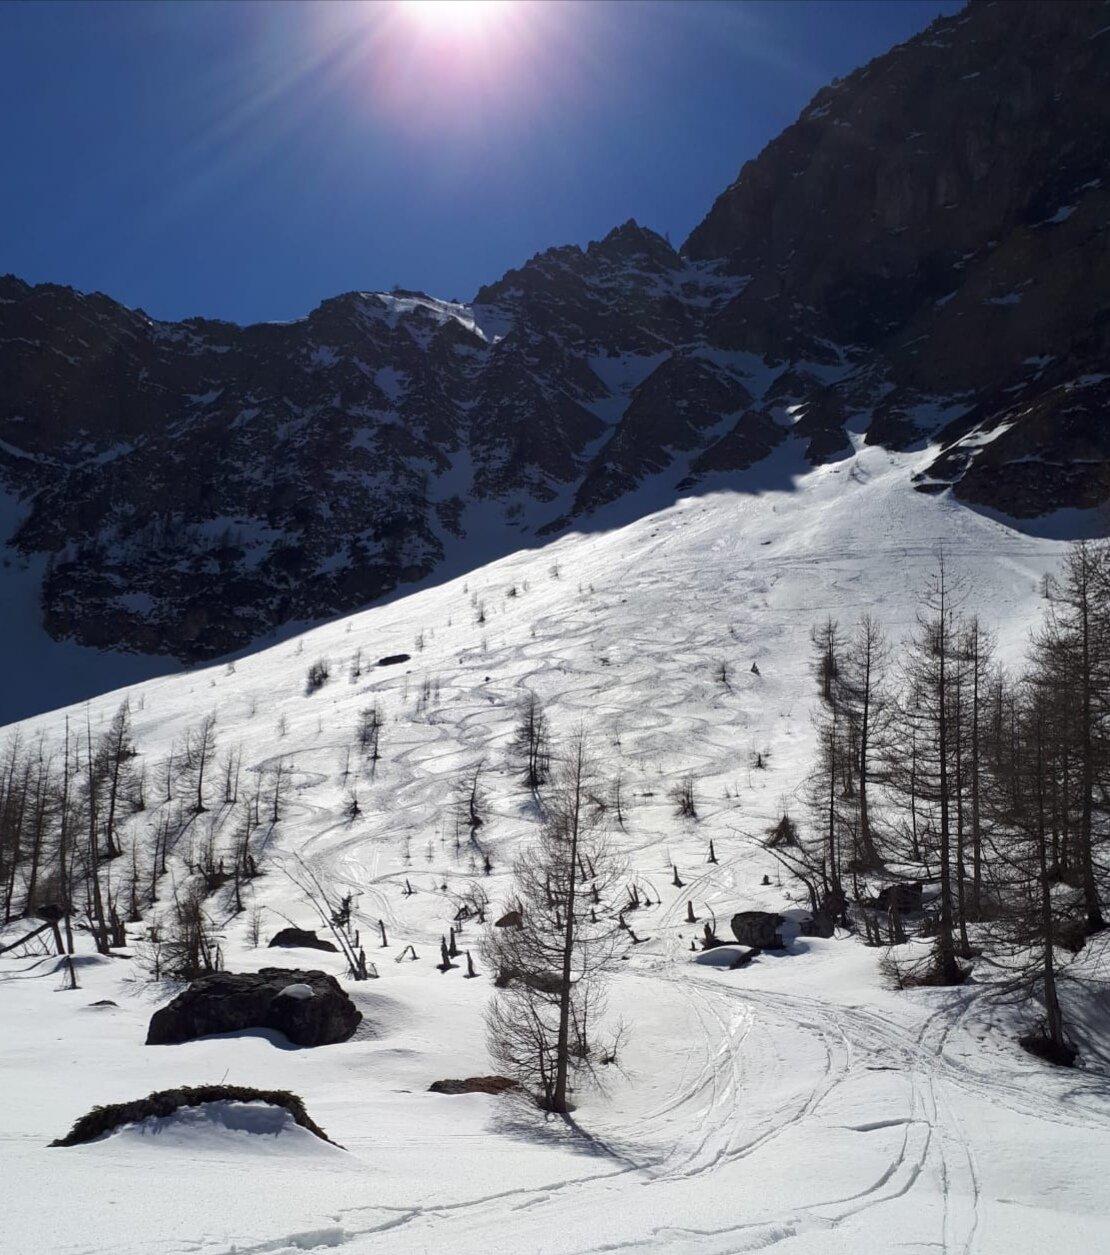 Enchiausa, Feuillas, Boeuf (Colli) da Chialvetta, giro dell'Oronaye 2019-03-17